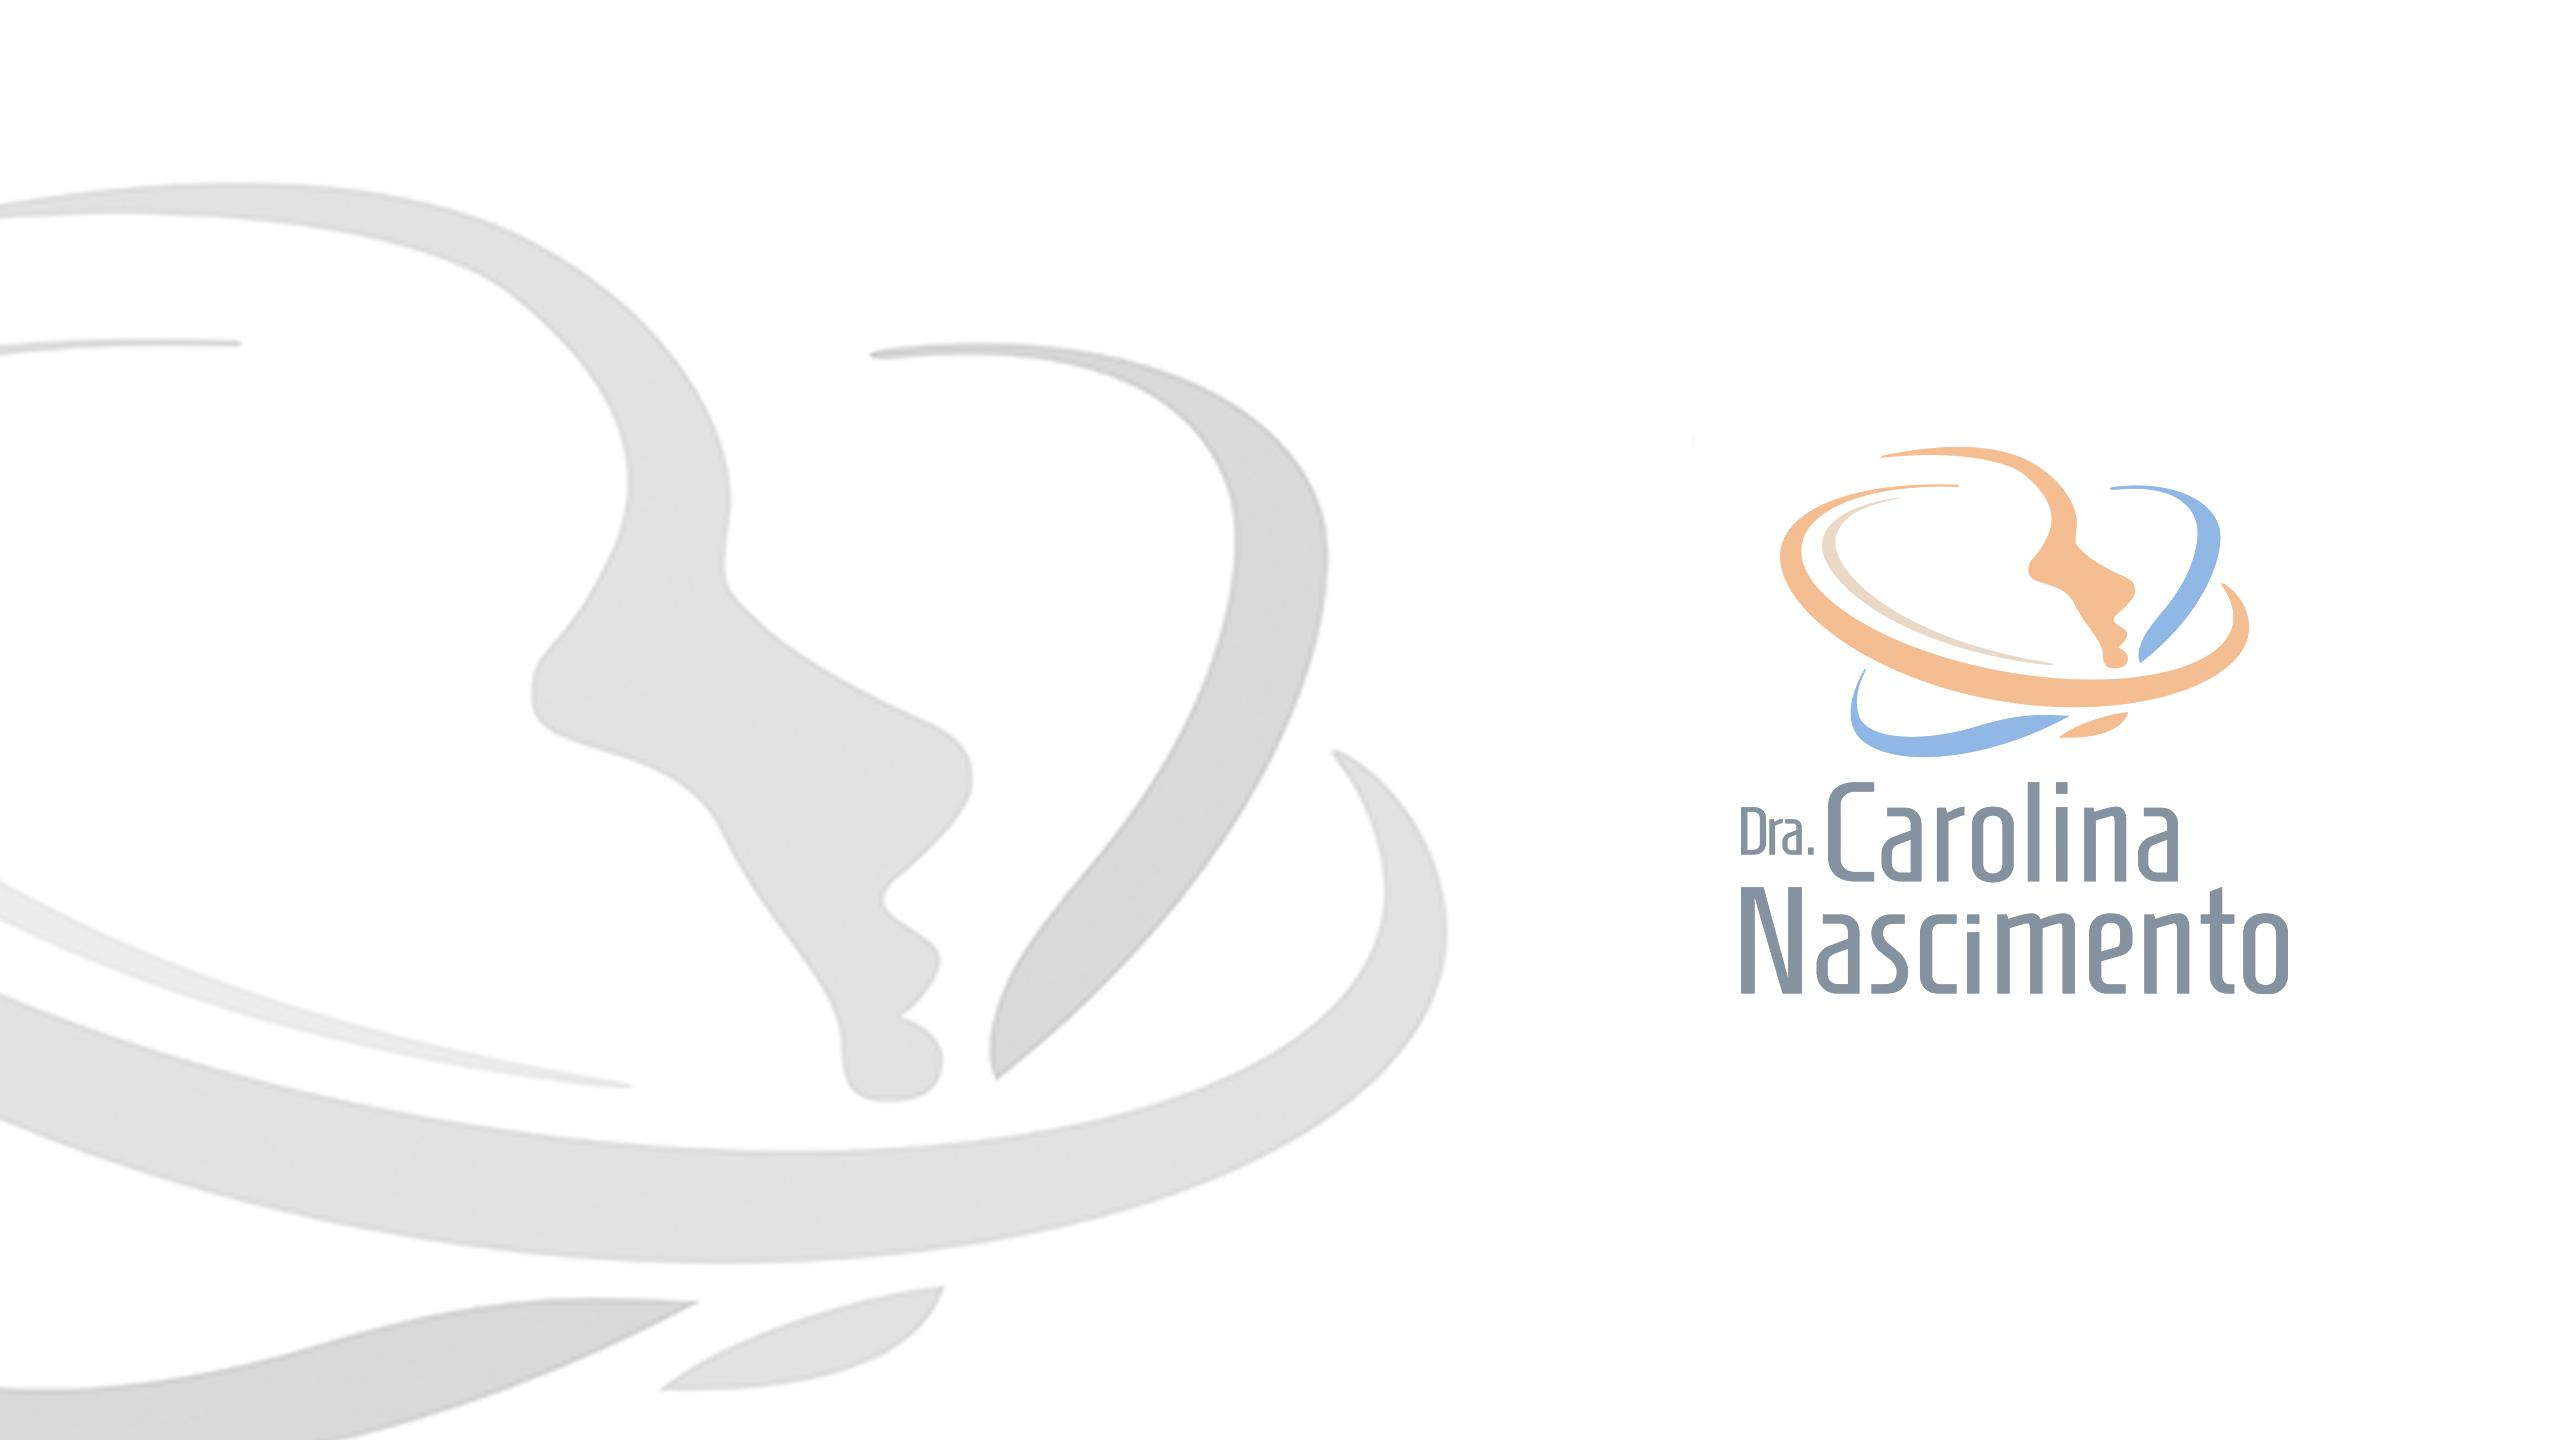 Dra Carolina Nascimento